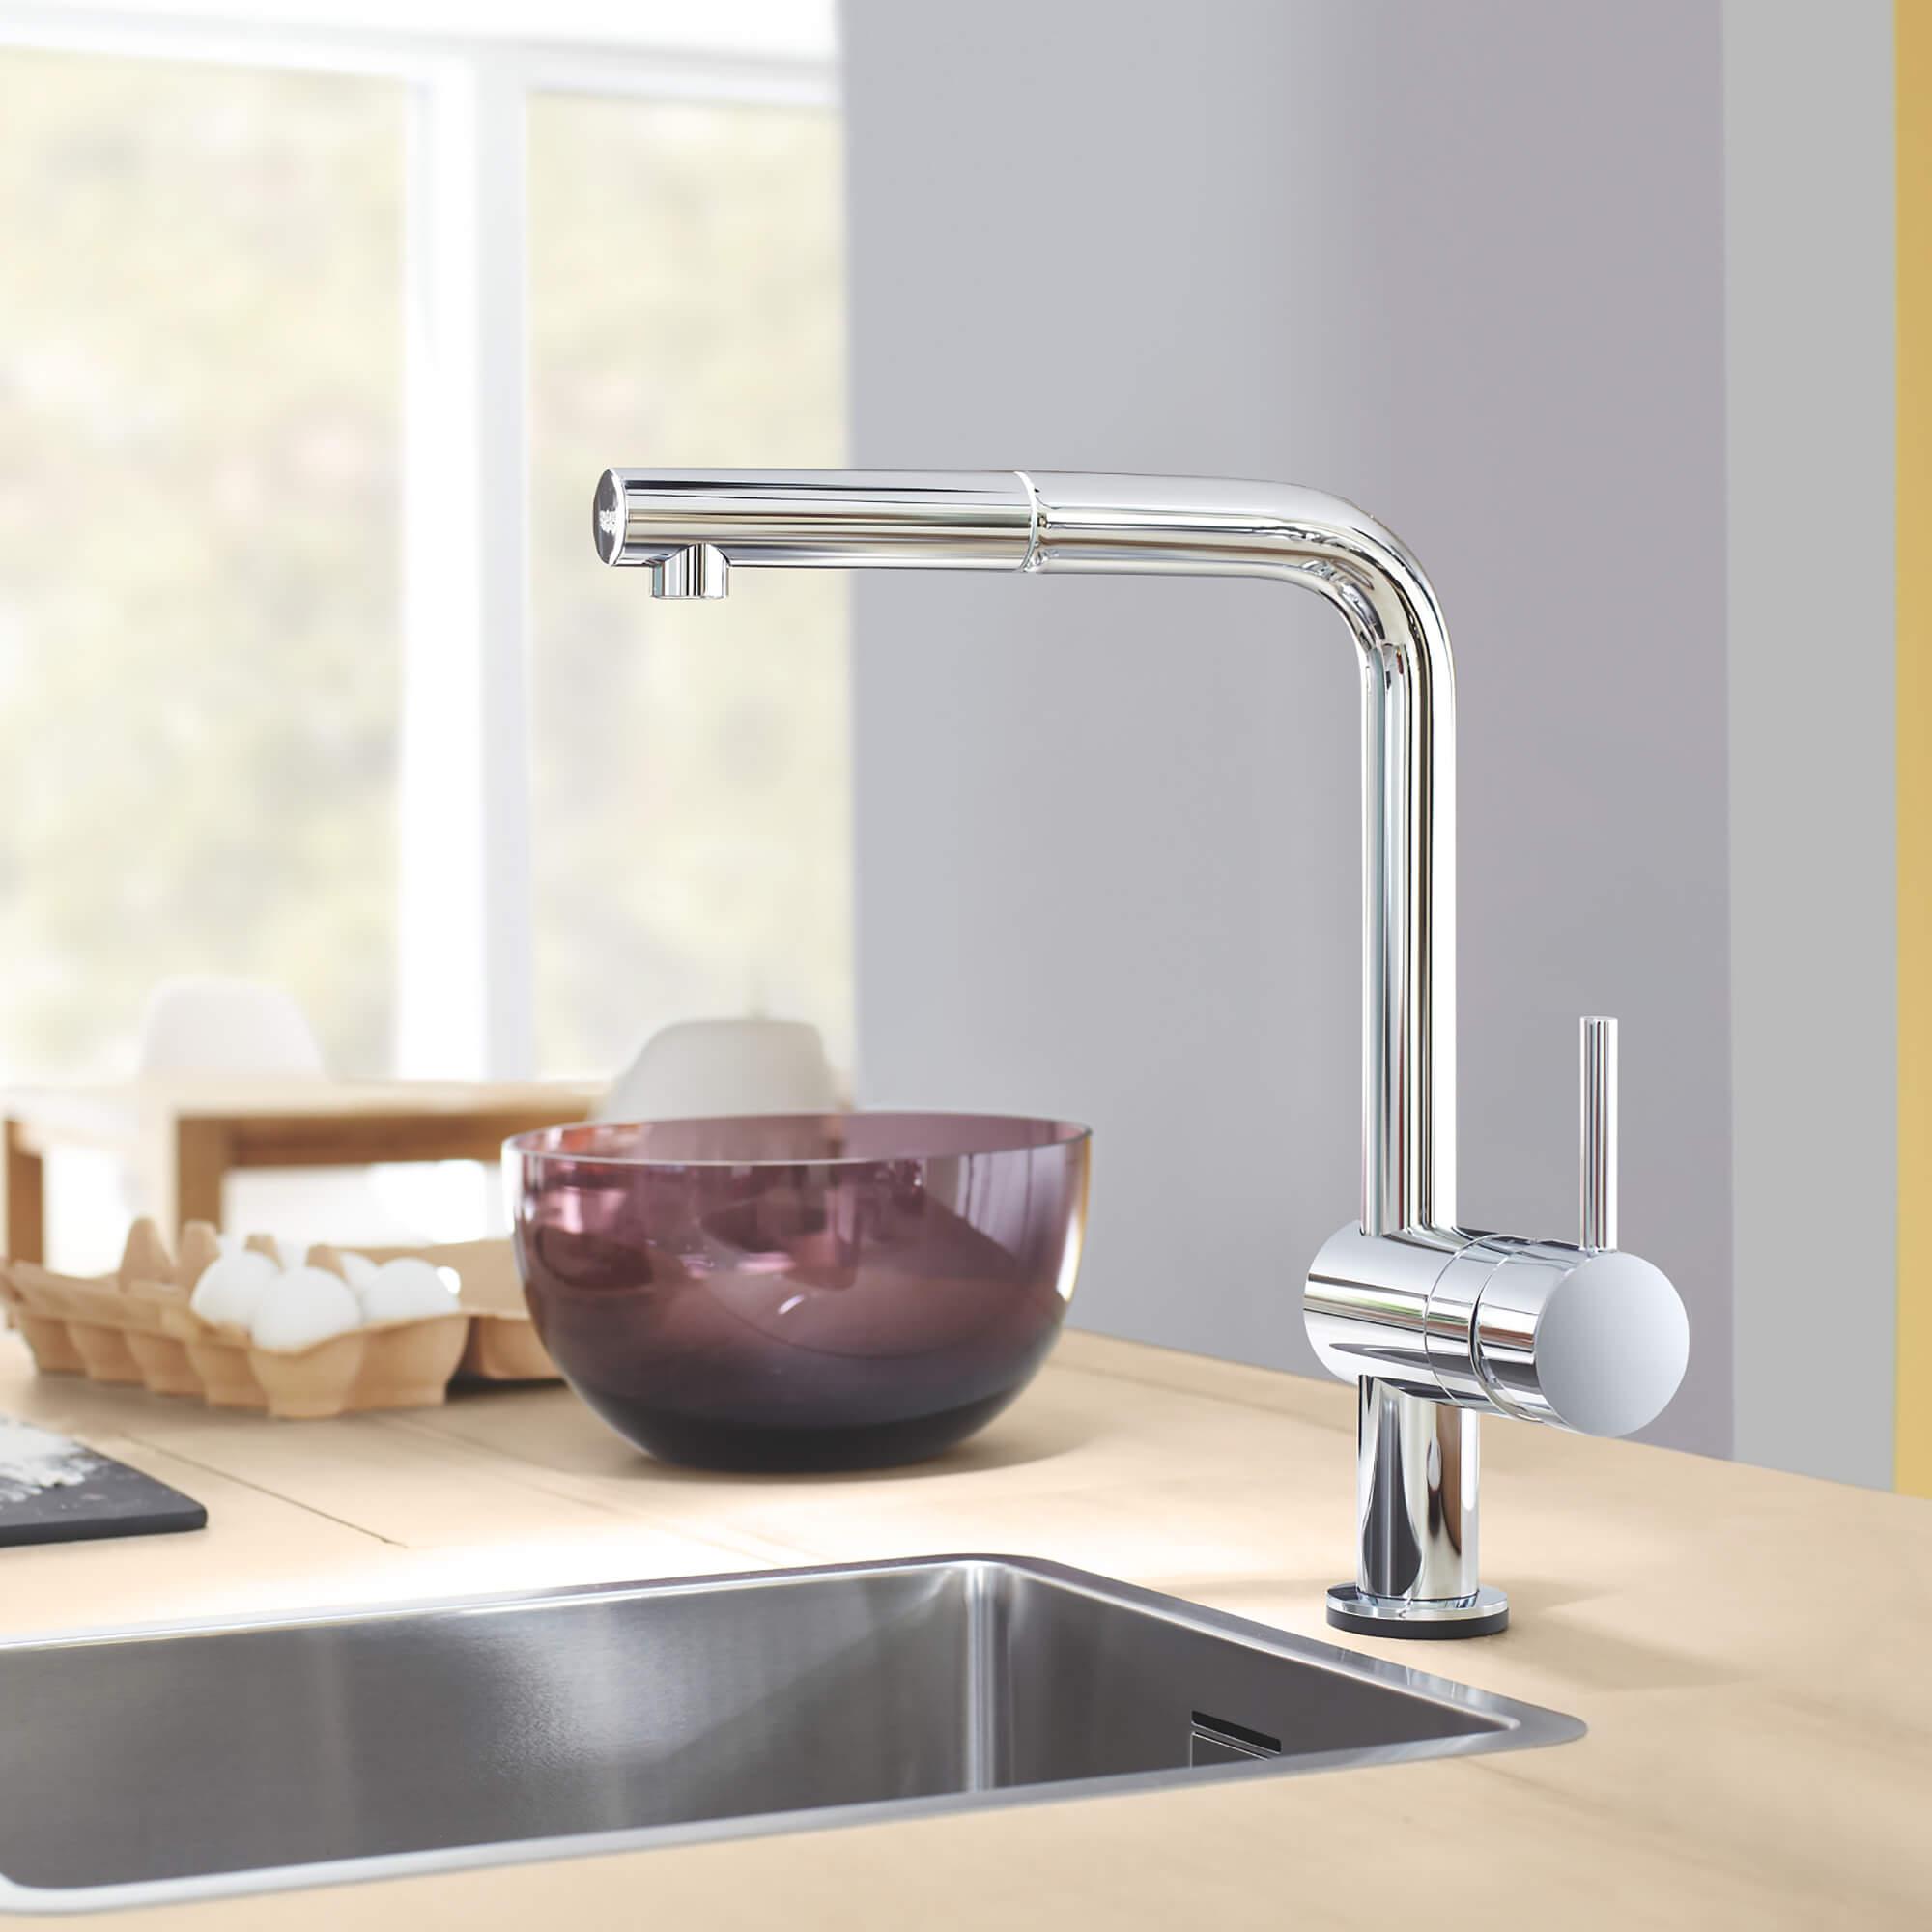 Minta Touch kitchen faucet